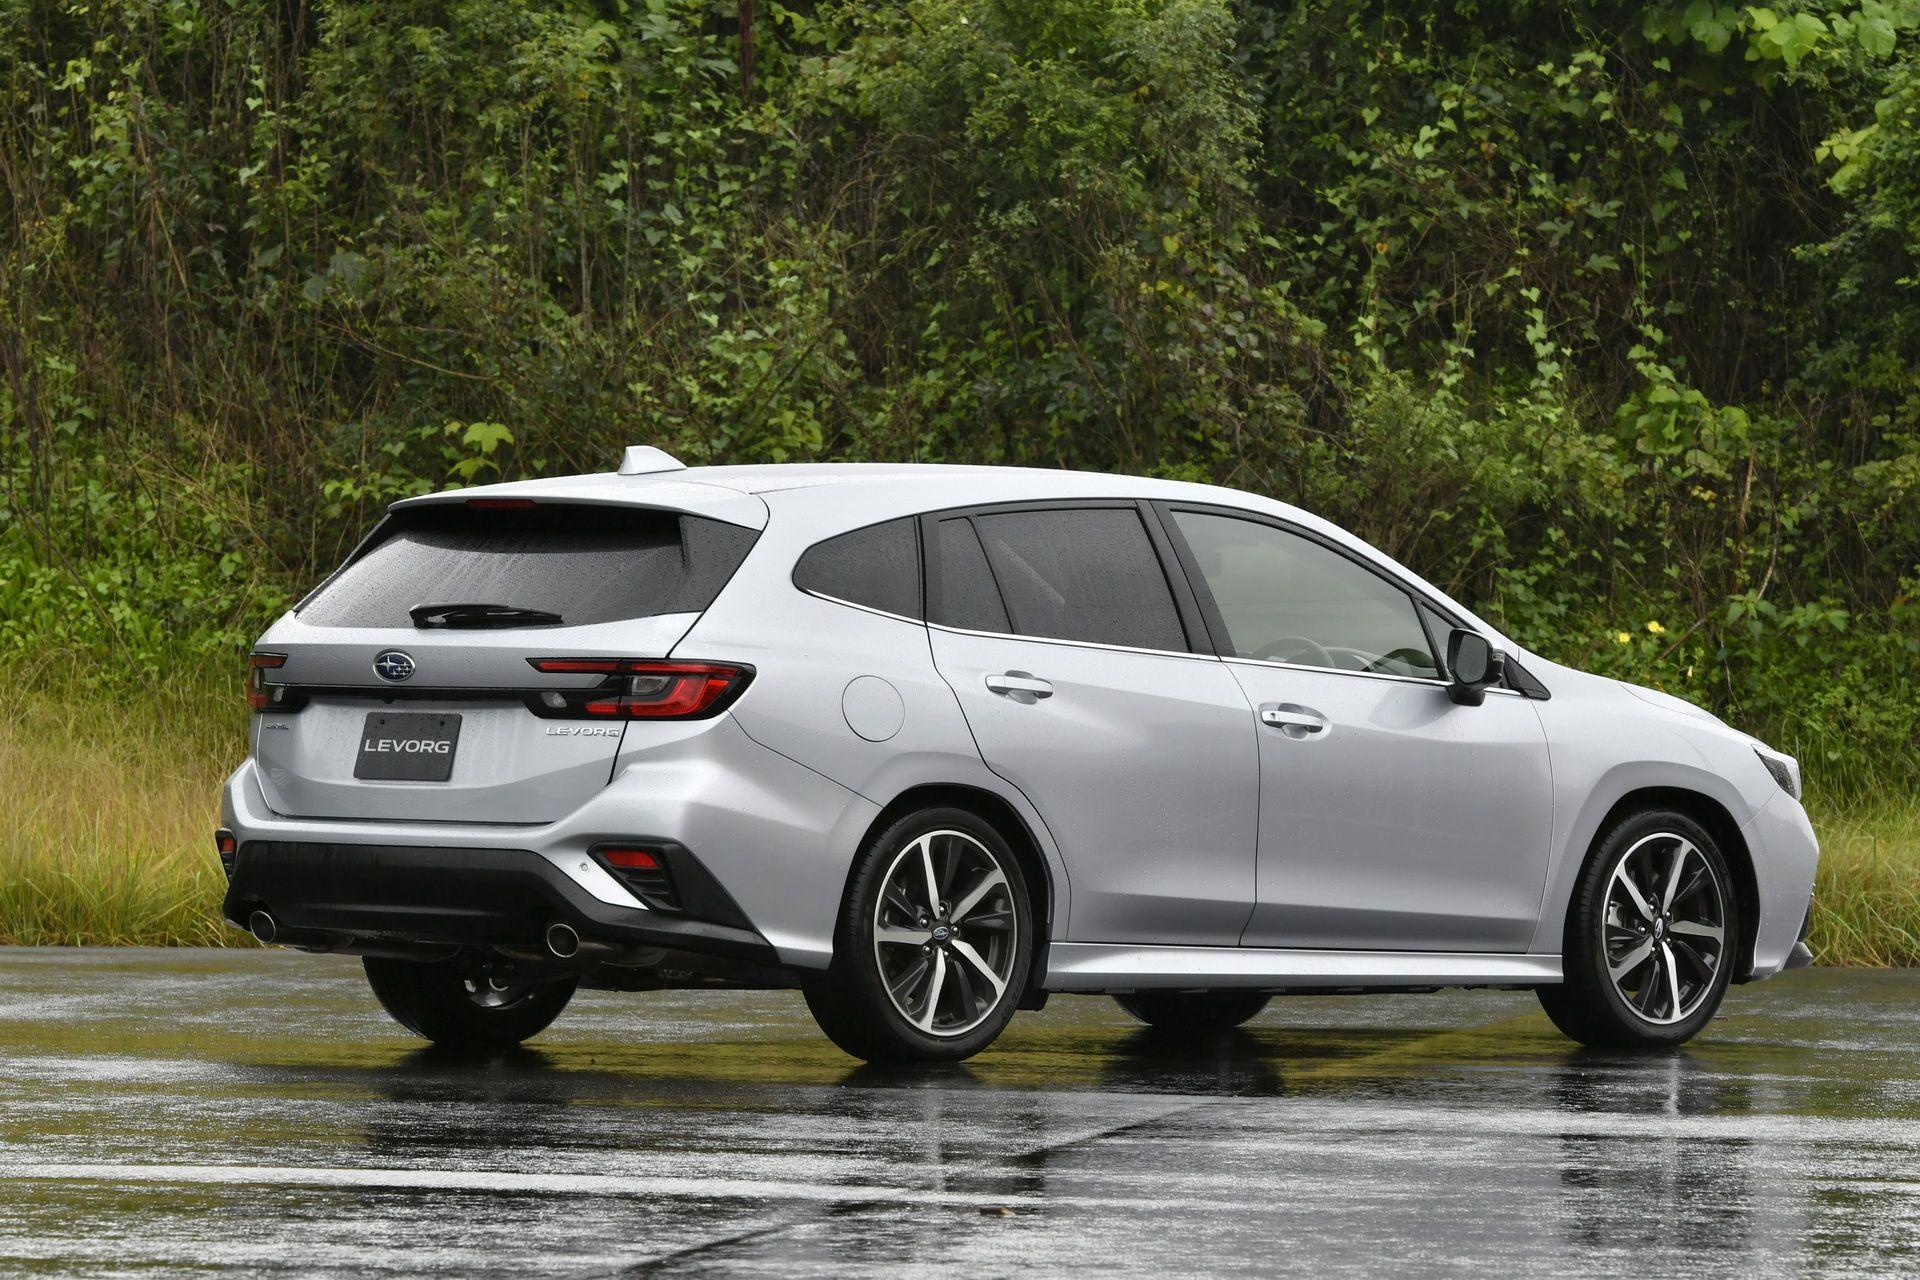 2021_Subaru_Levorg_0028